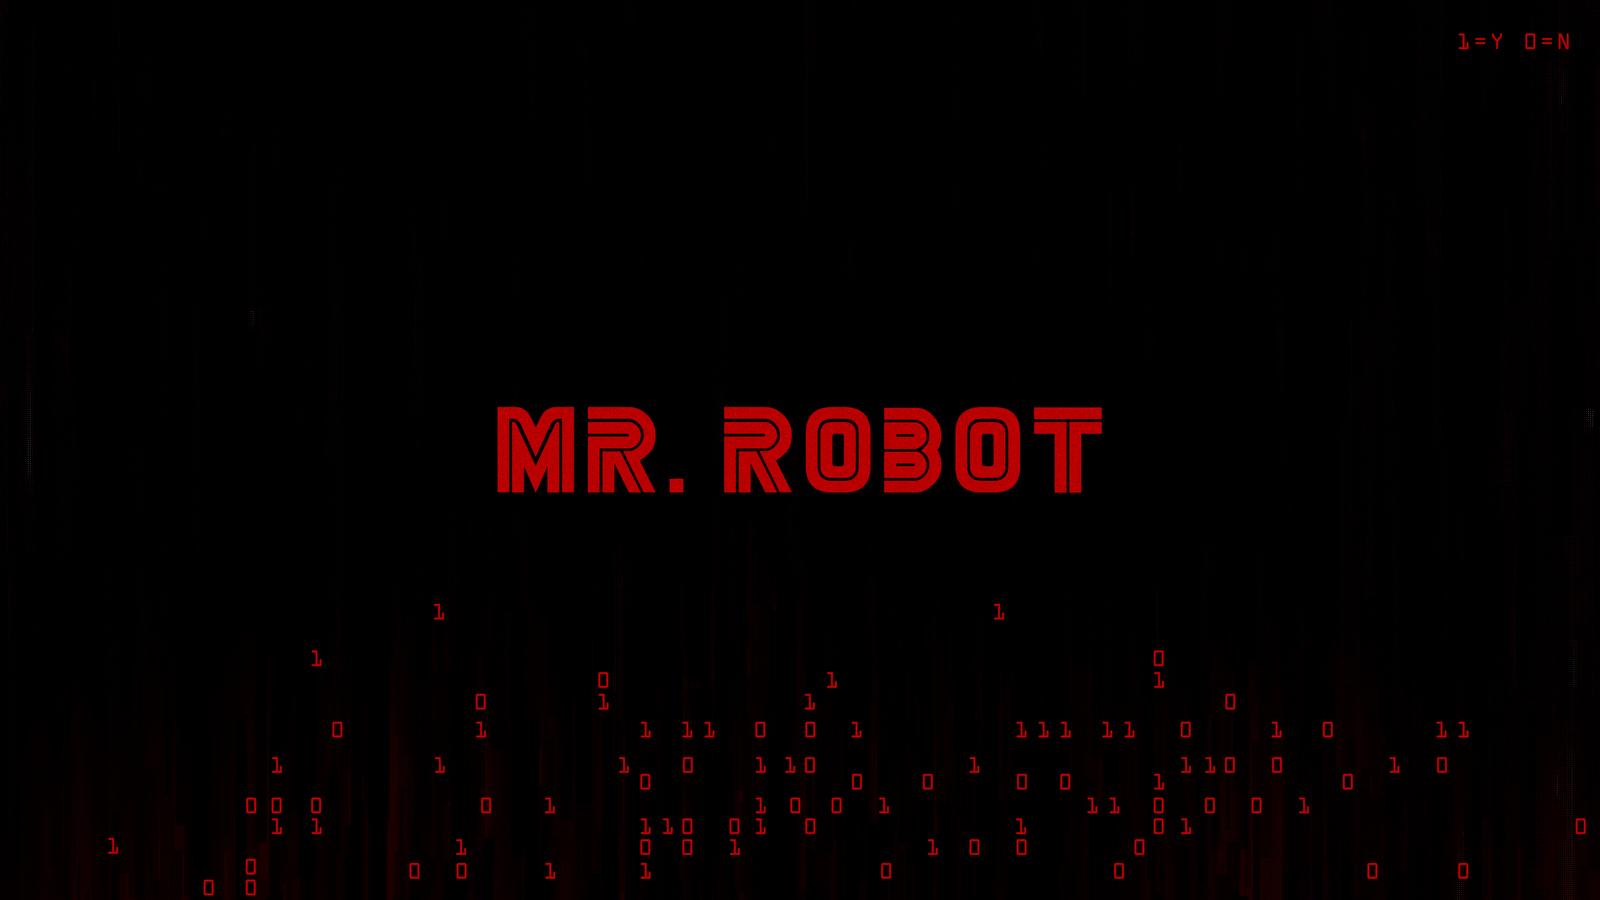 1600x900 Mr Robot Logo 4k 2018 1600x900 Resolution Hd 4k